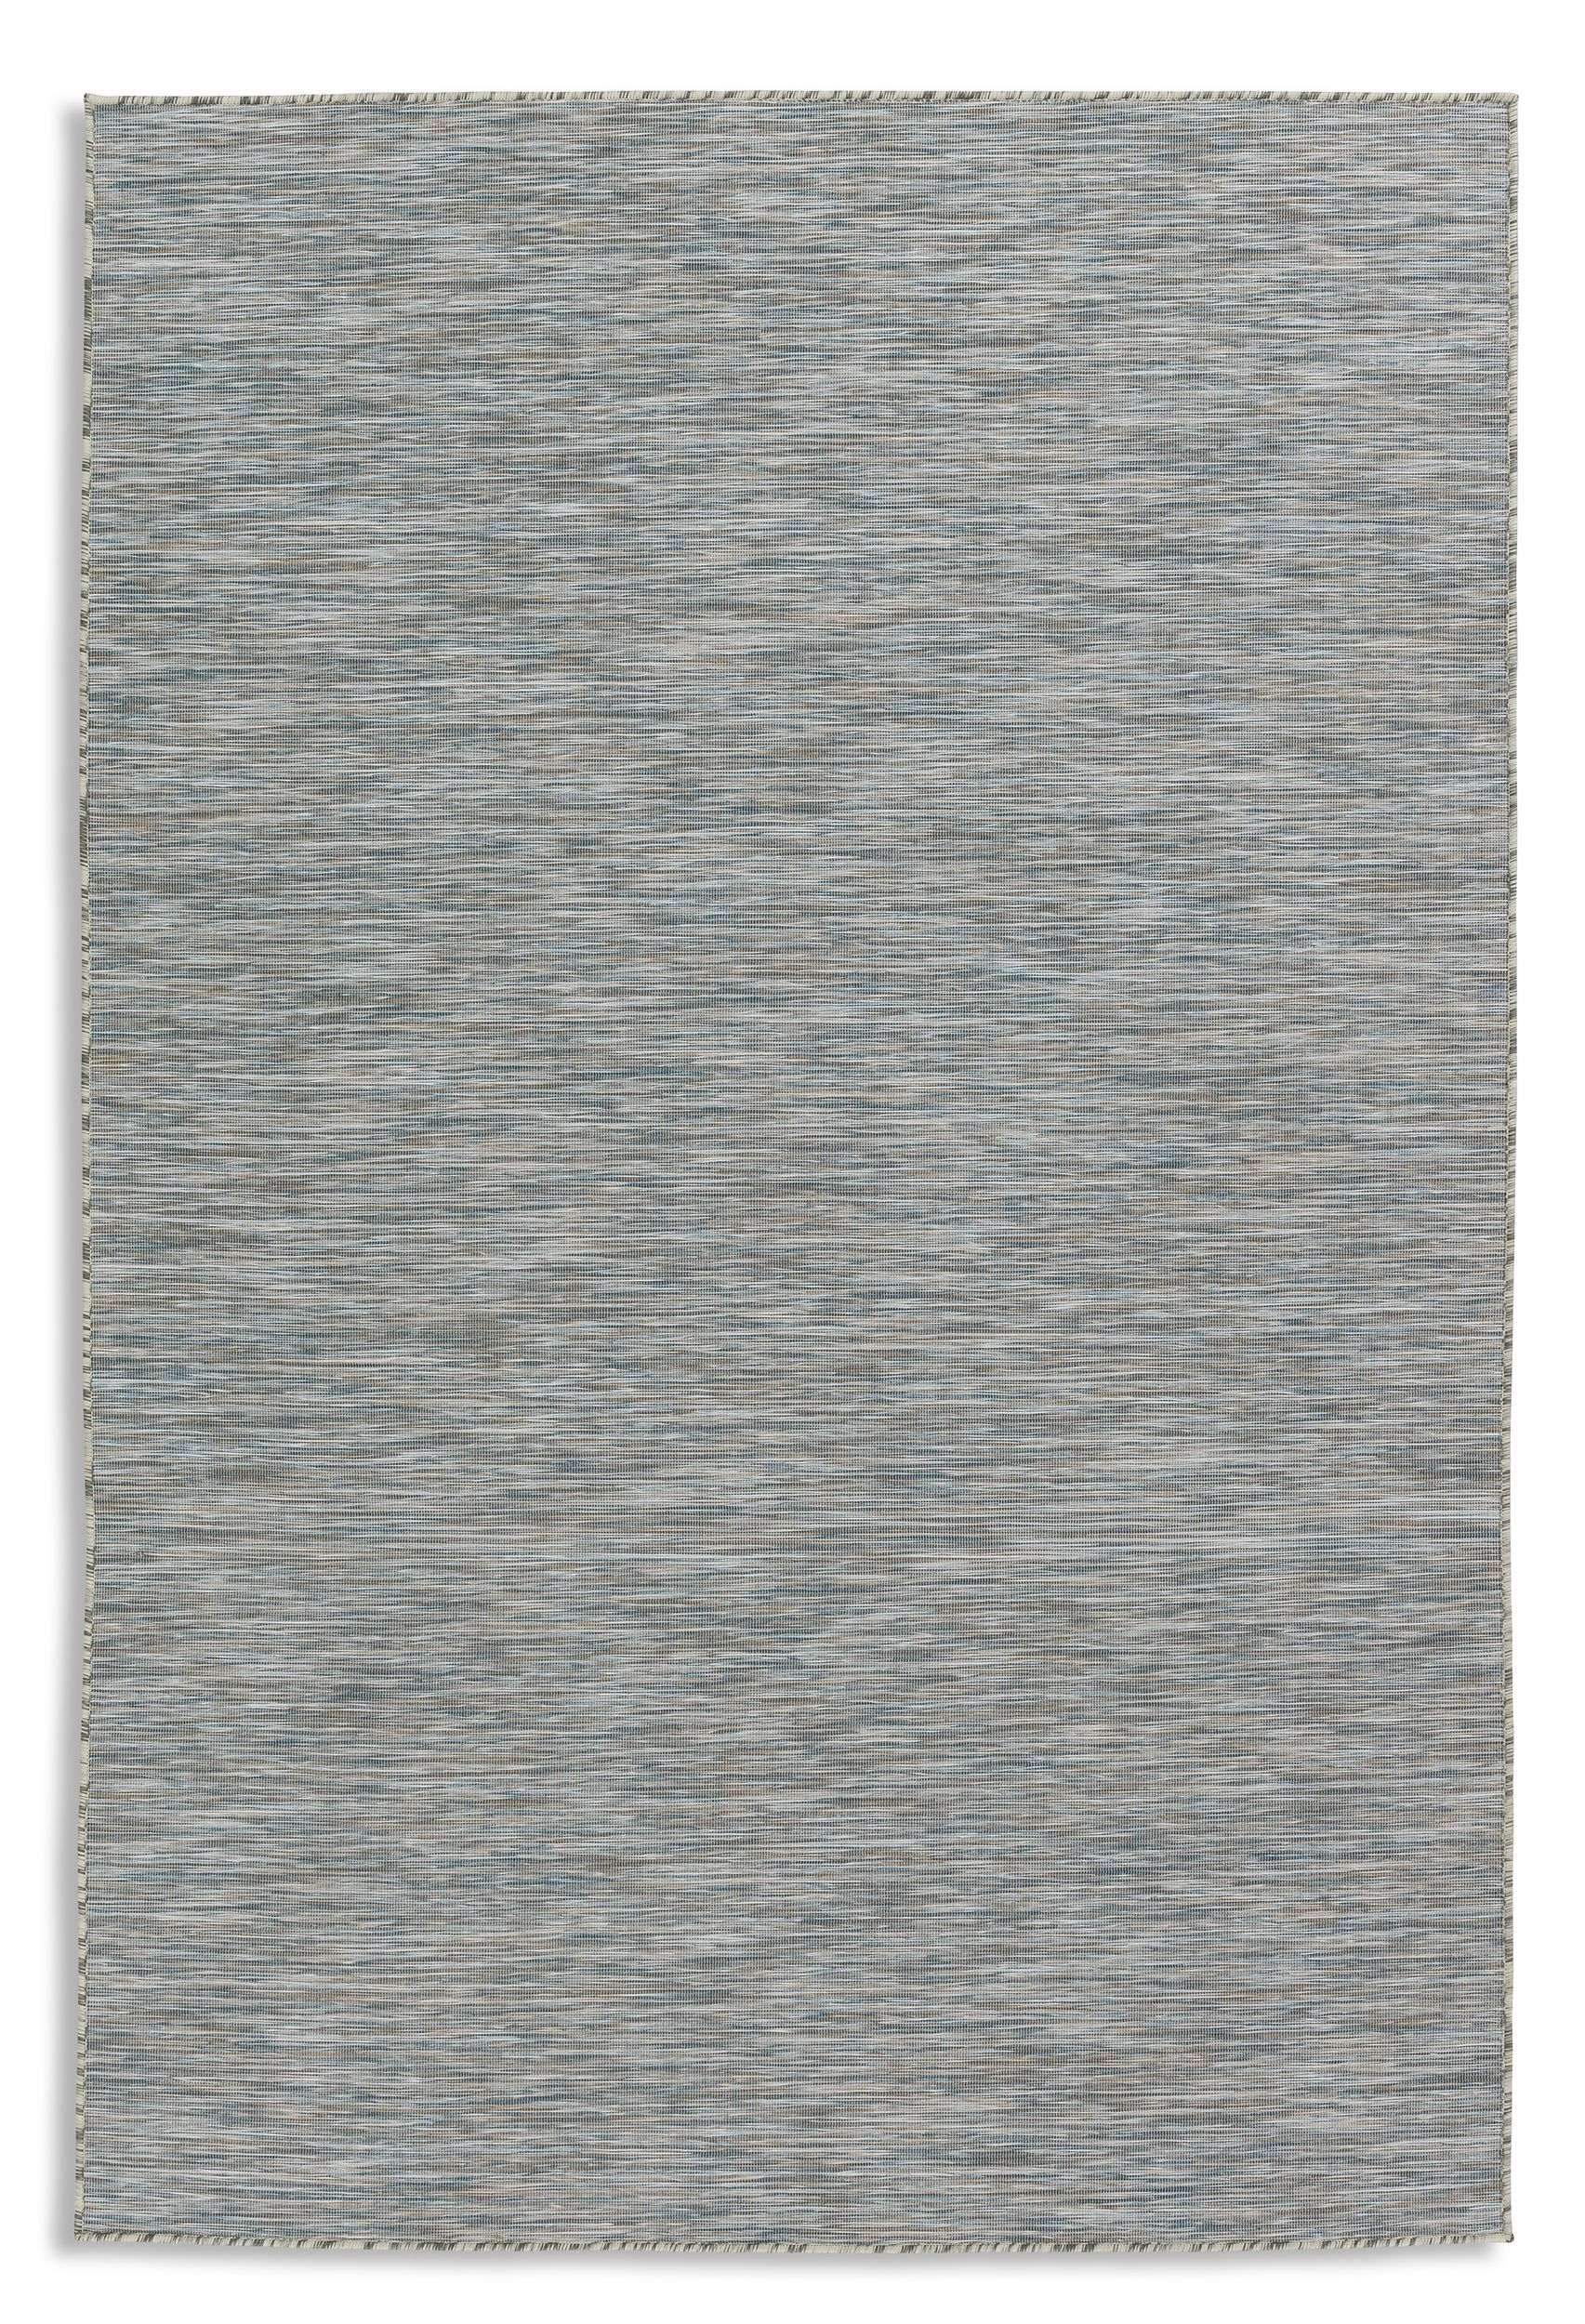 Teppich 200x290cm AMALFI